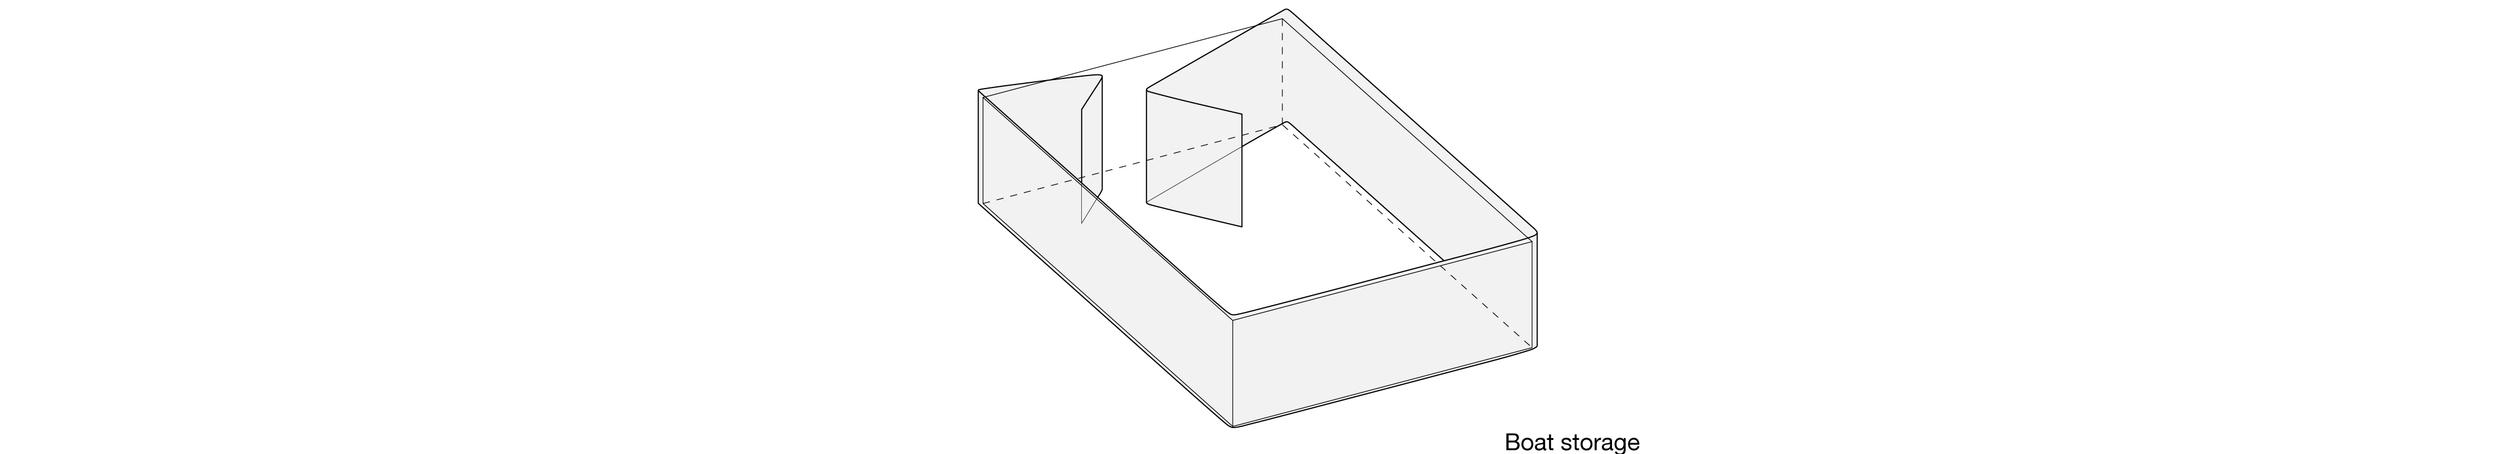 boatstorage diagram-01-01.jpg